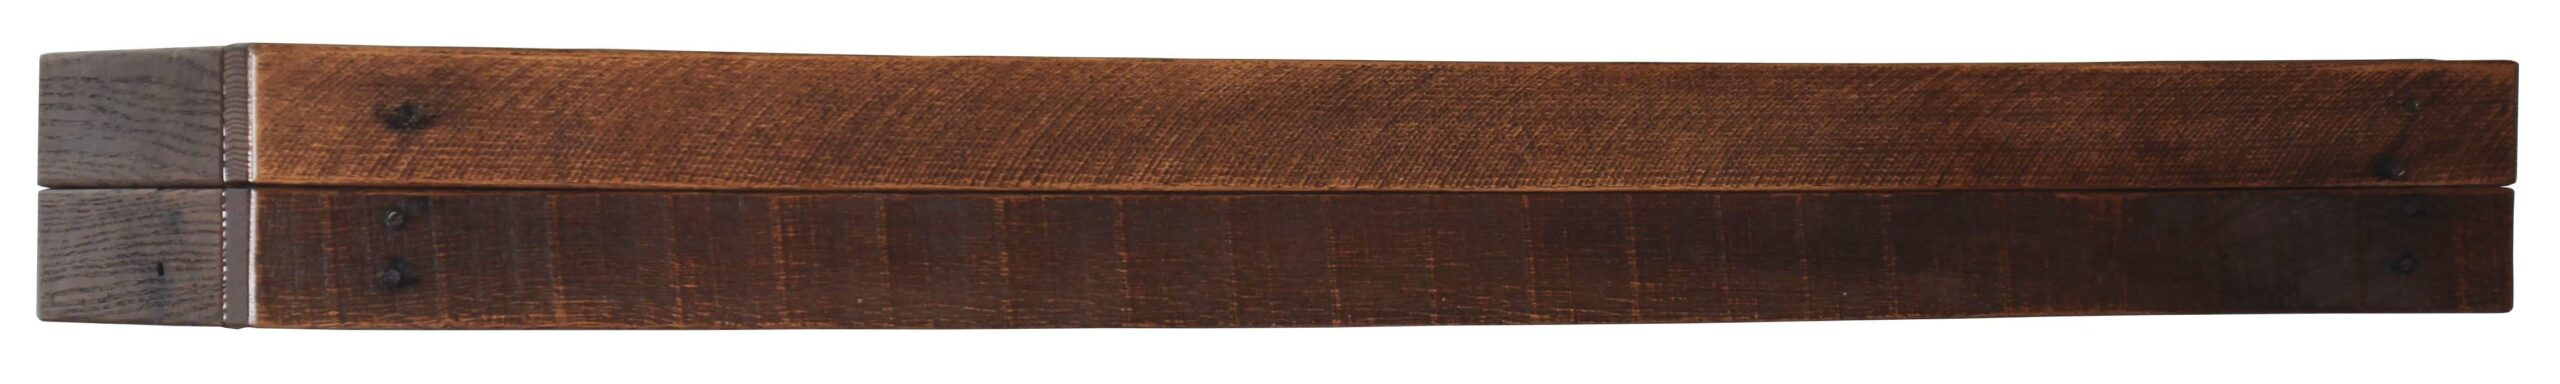 R222123 Rustic Box Shelf